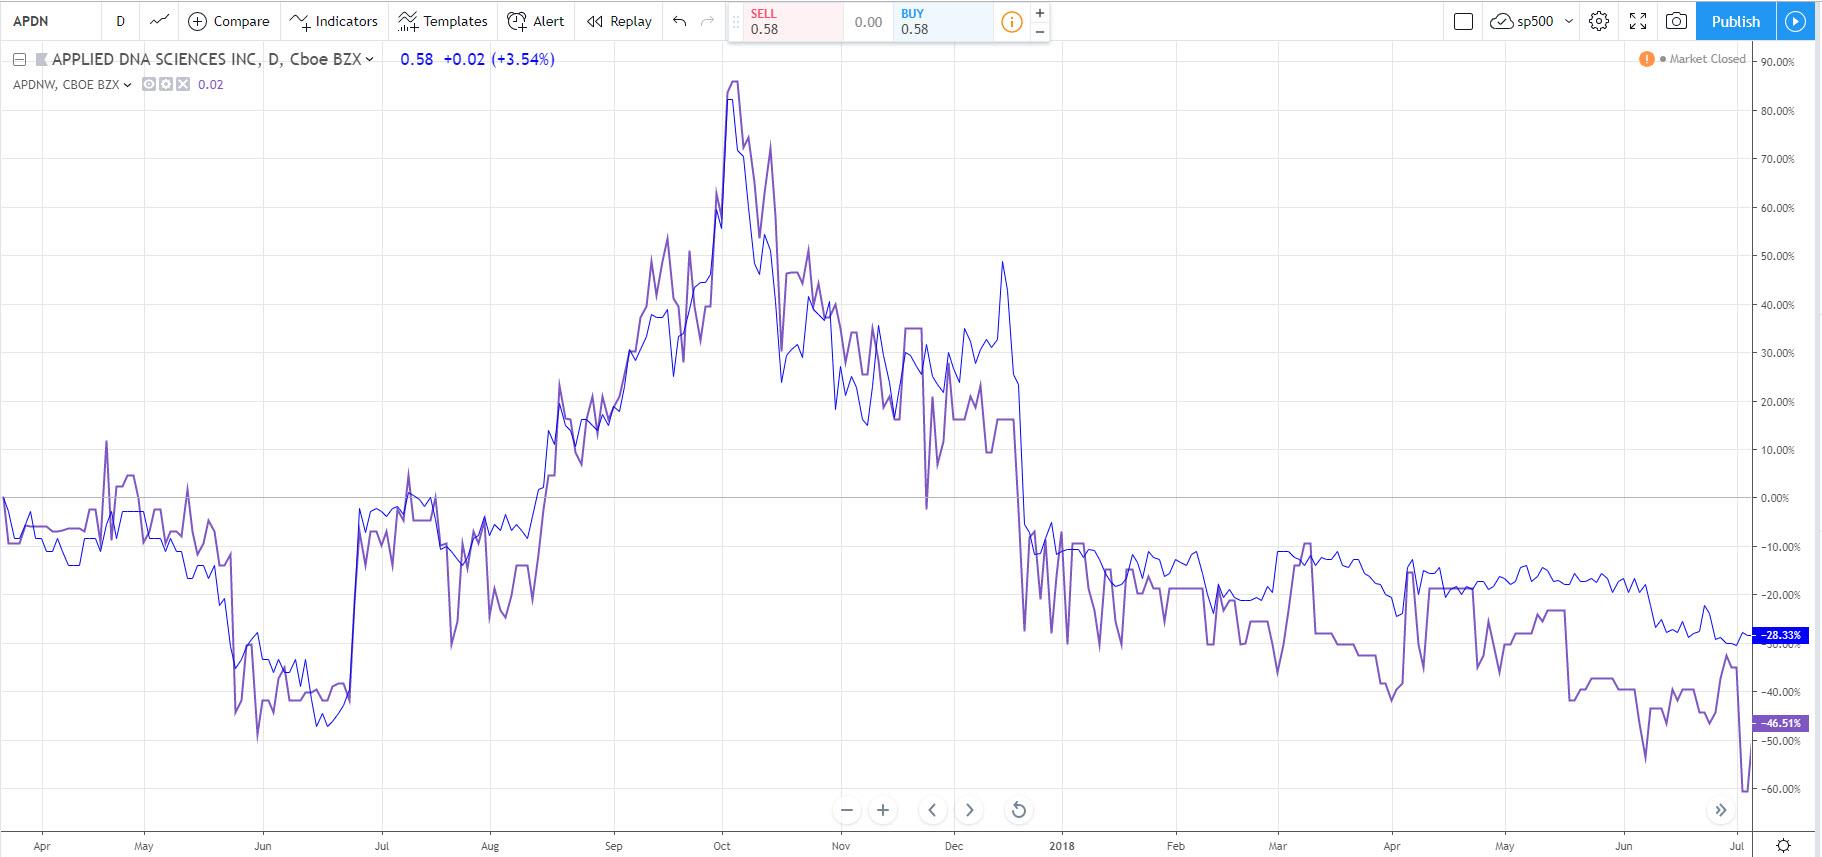 сравнение акции с варрантами на акции - парный трейдинг